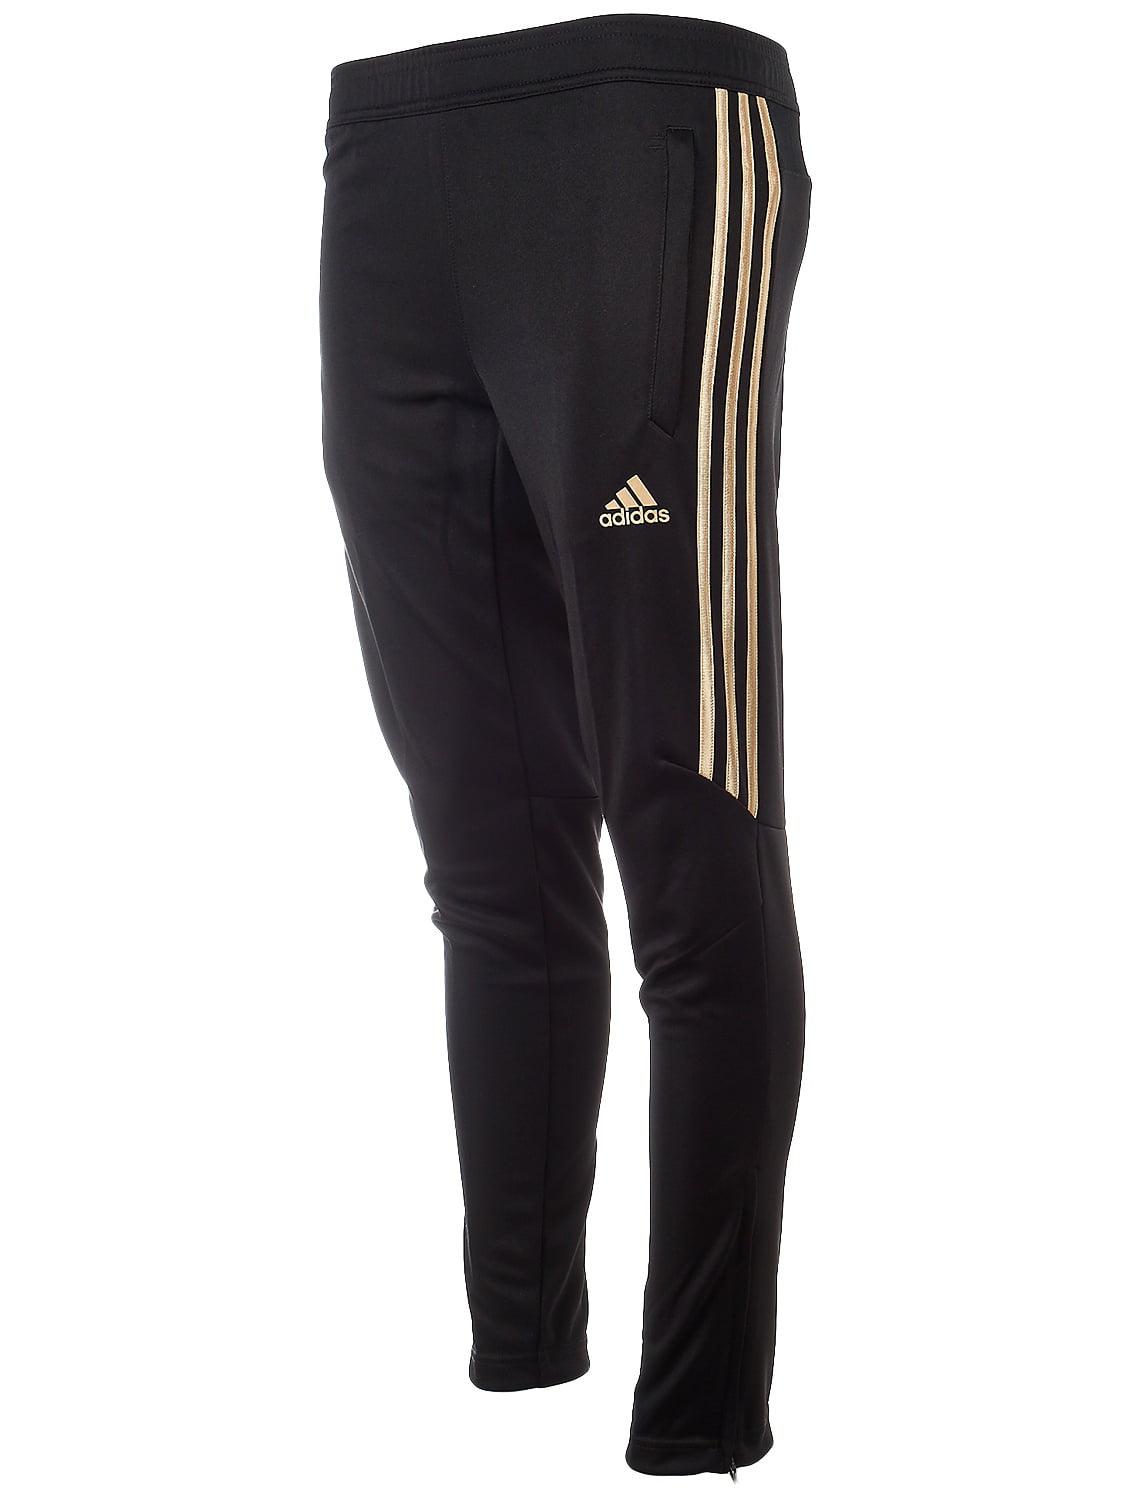 Adidas - Adidas Tiro 17 Training Pants